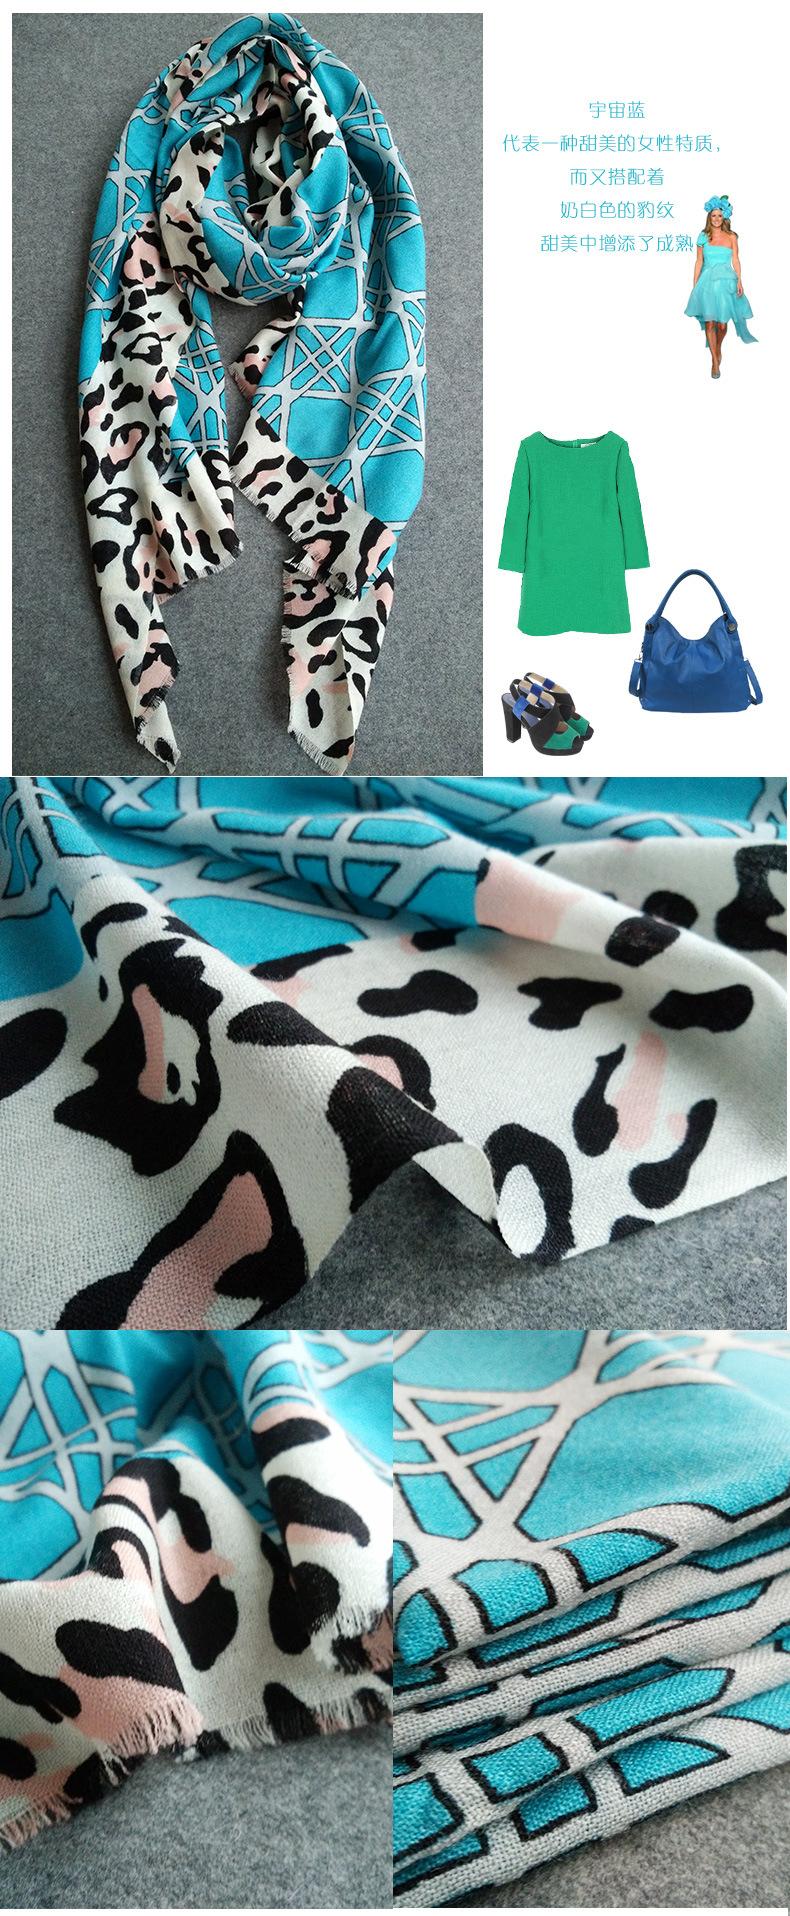 Rjcc Cashmere Czech New Autumn And Winter Fashion Lady All-match Sexy Leopard Stitching 80 Pure Wool Scarf Plain 2016